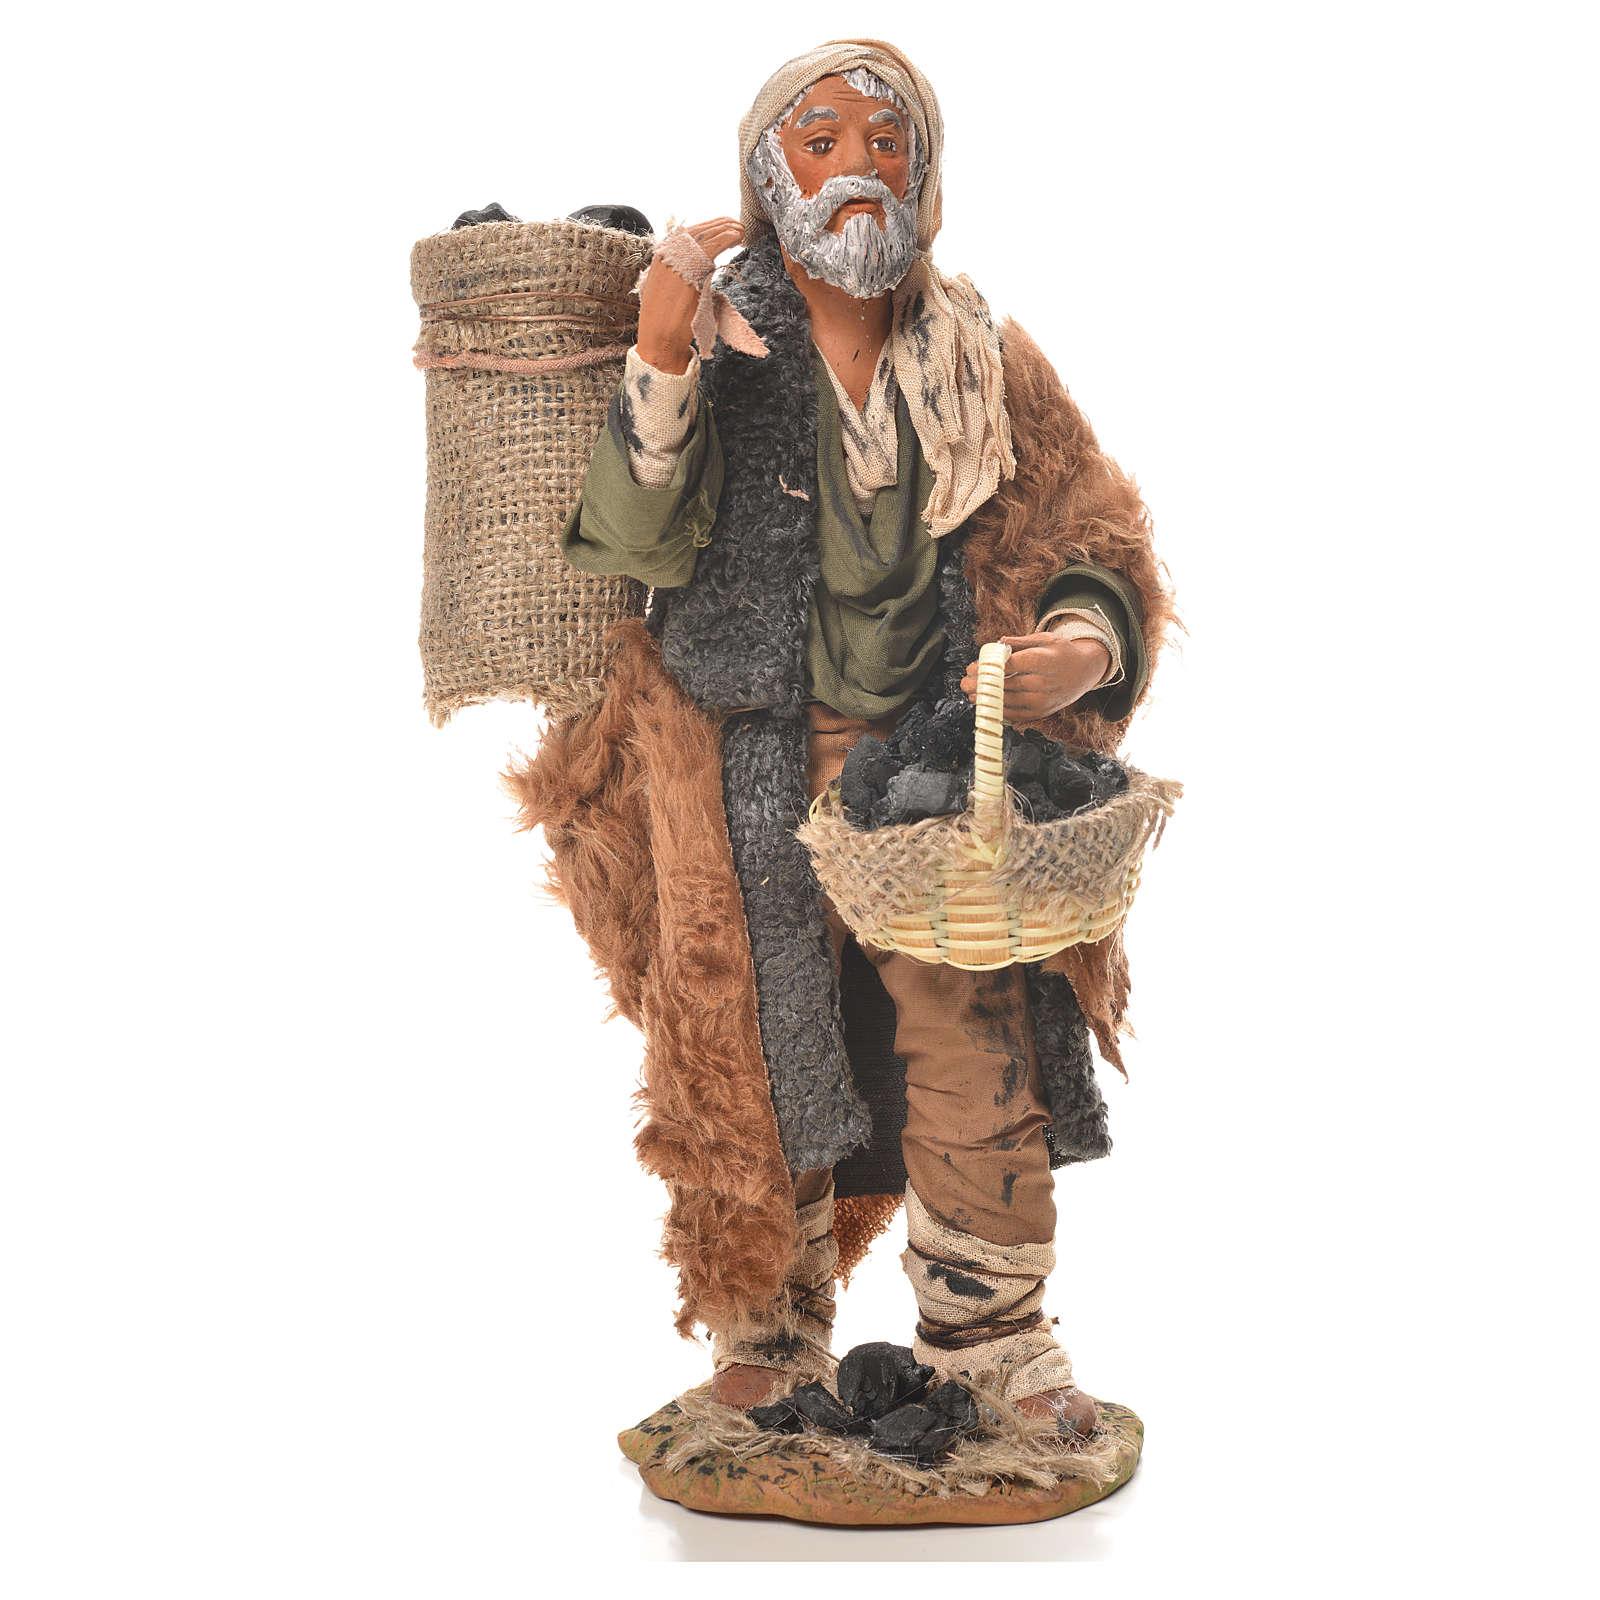 Charcoal burner with sack, Neapolitan nativity figurine 24cm 4